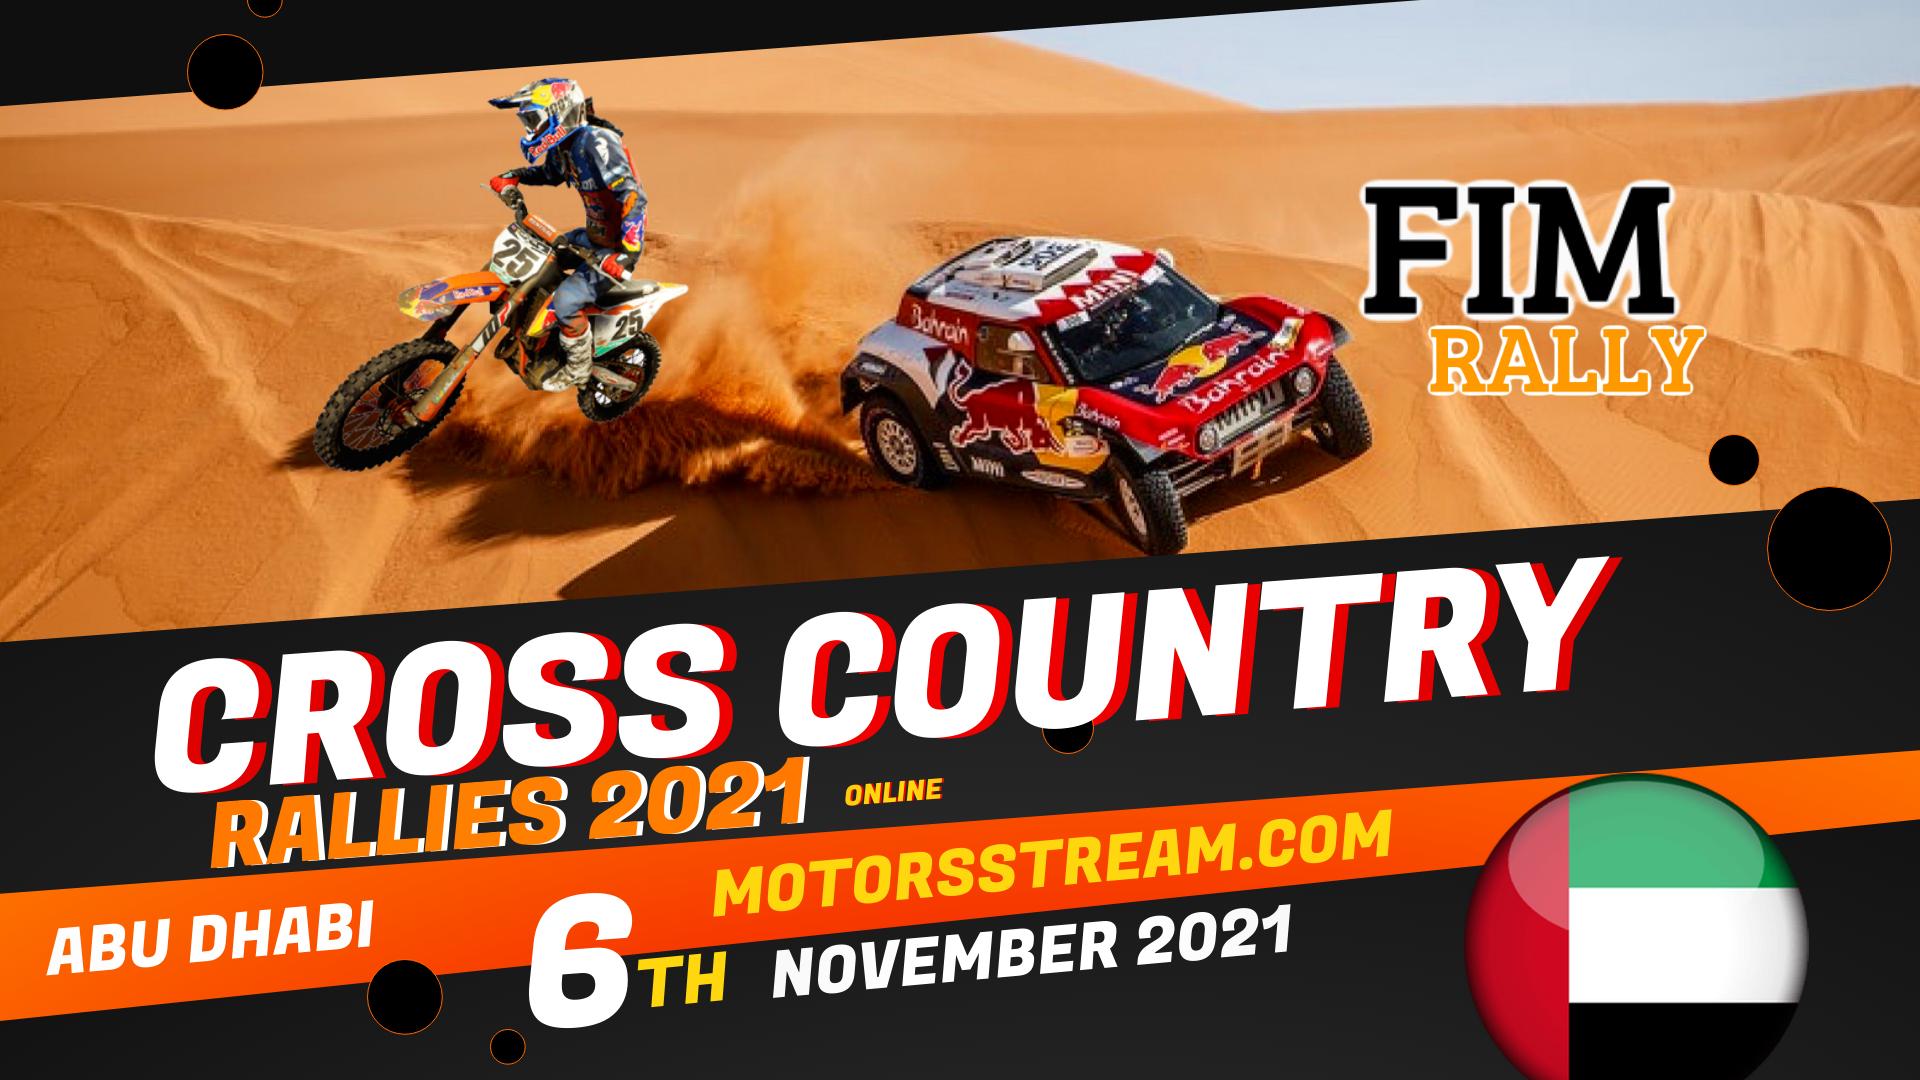 Abu Dhabi Cross Country Rallies Live Stream 2021